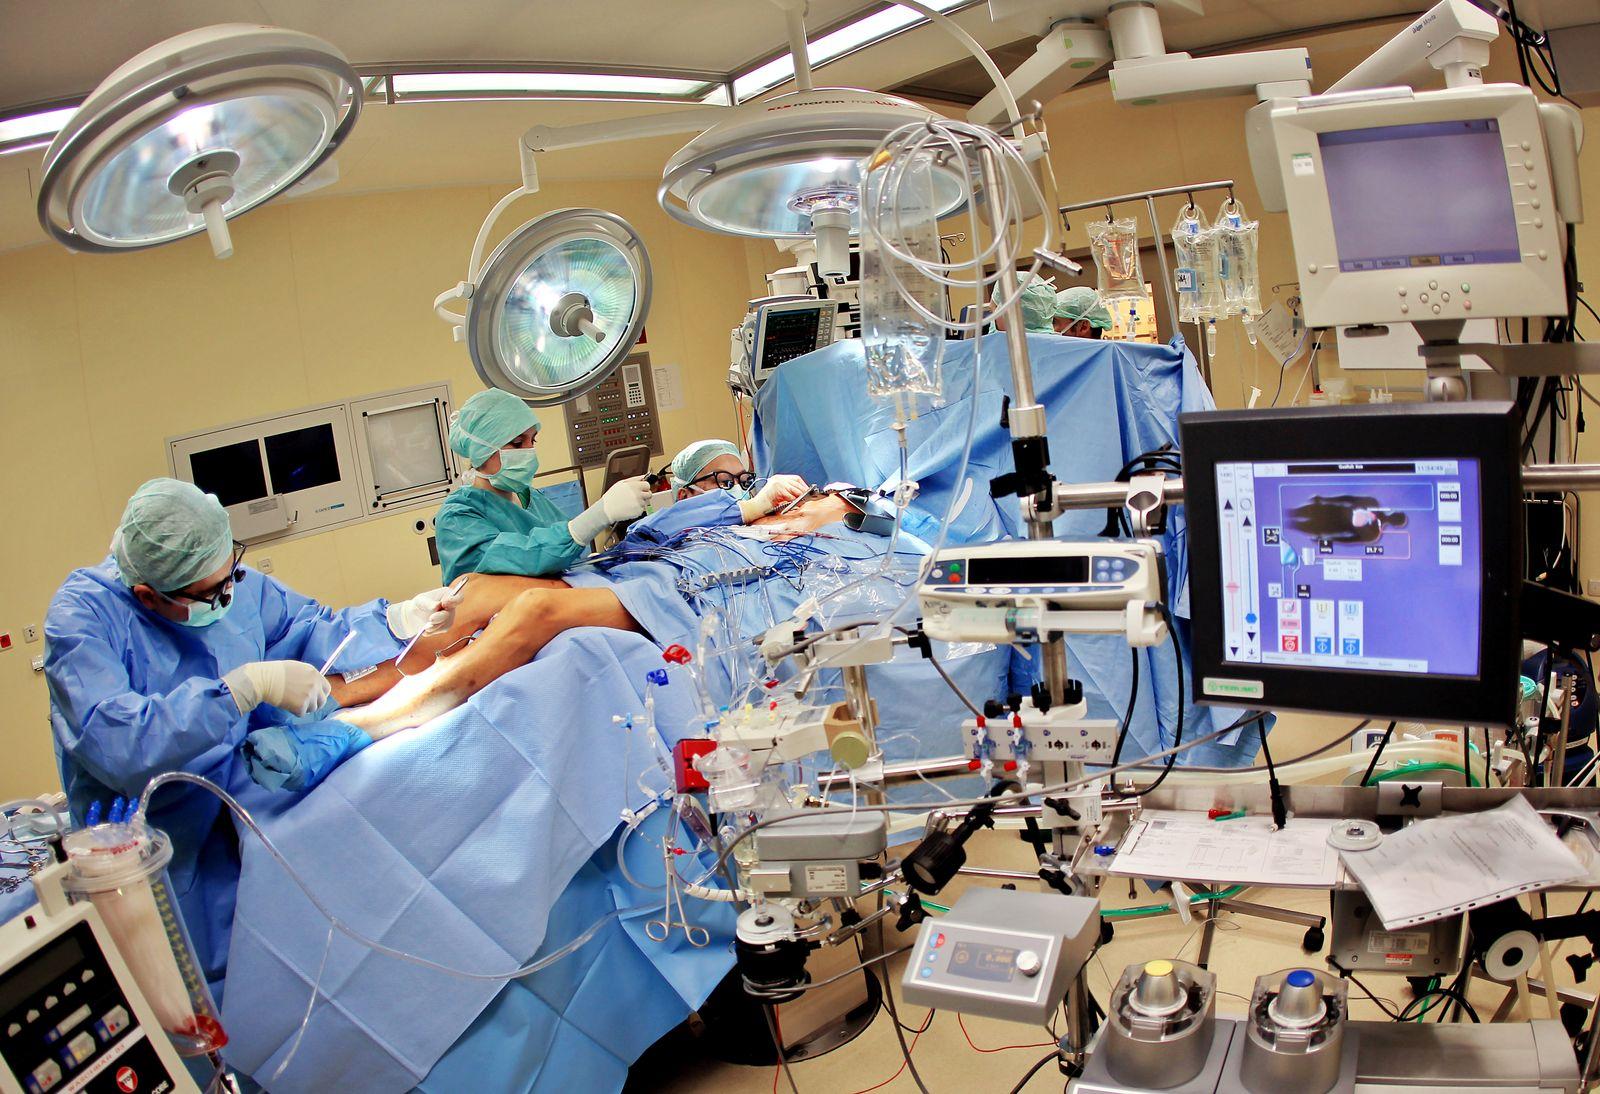 Gesundheit / Operation / Krankenhaus / Universitätsklinik